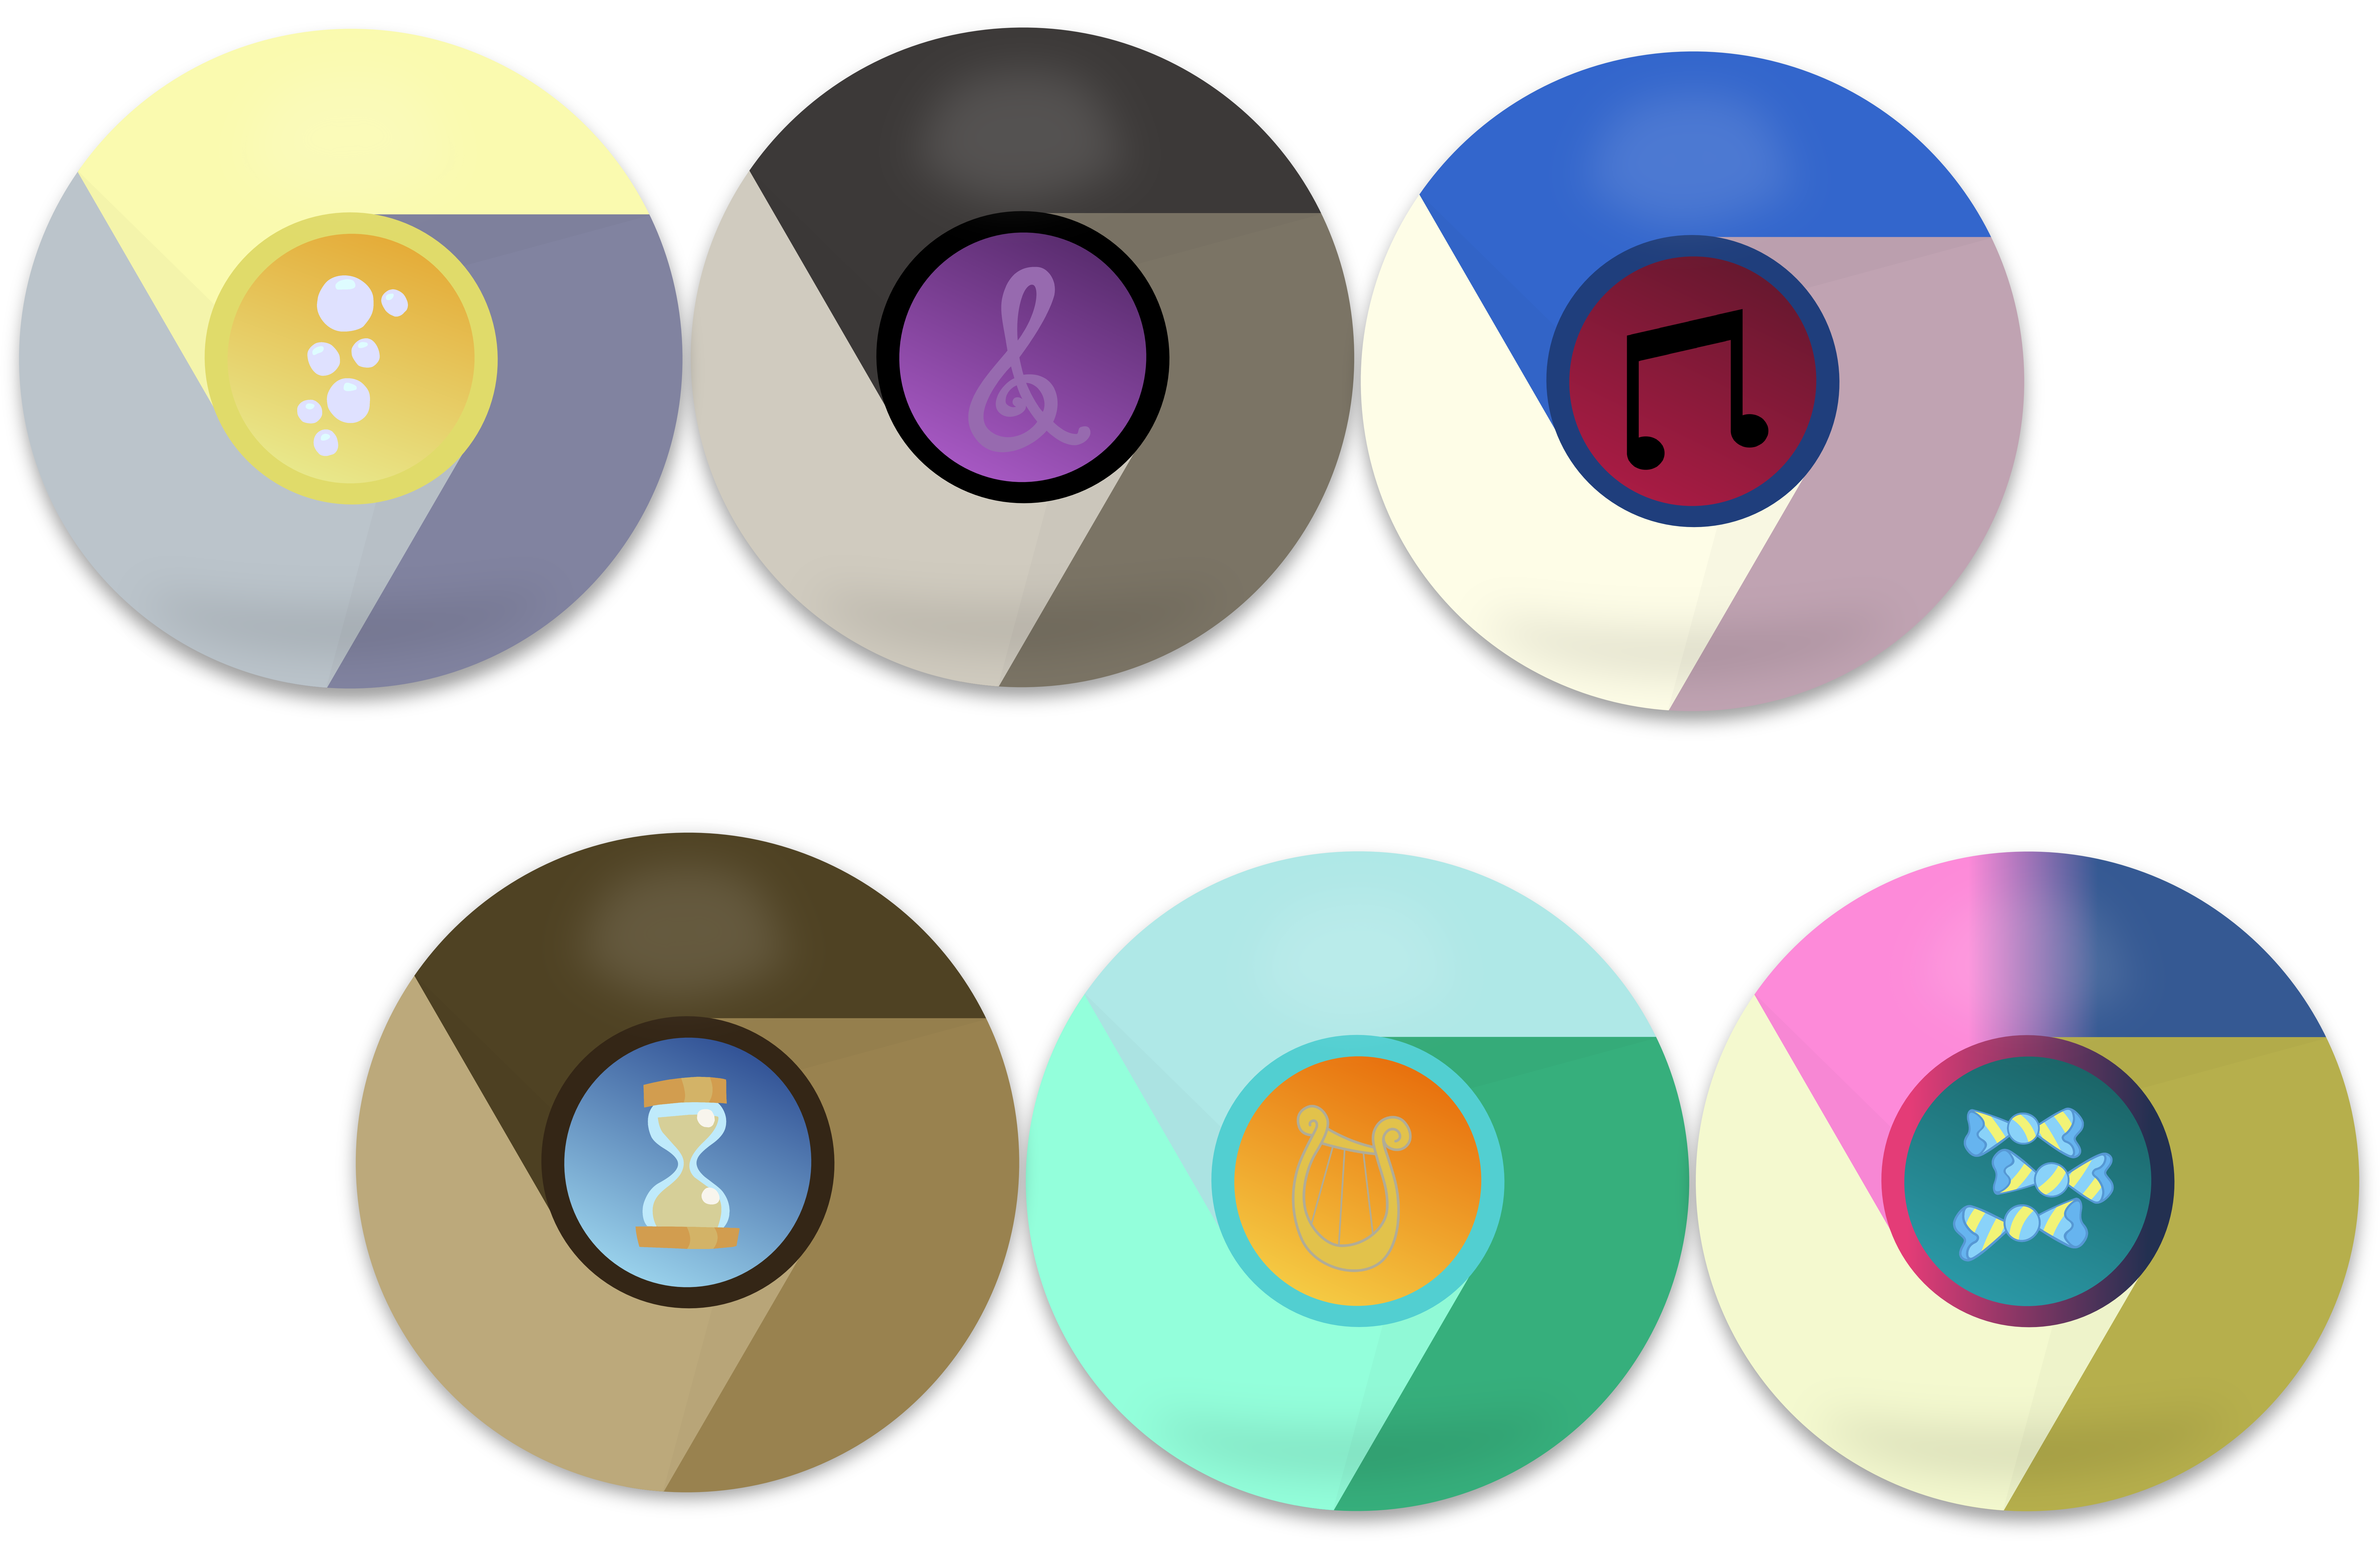 2nd Mane 6 Google Chrome Icons by EMedina13 on DeviantArt